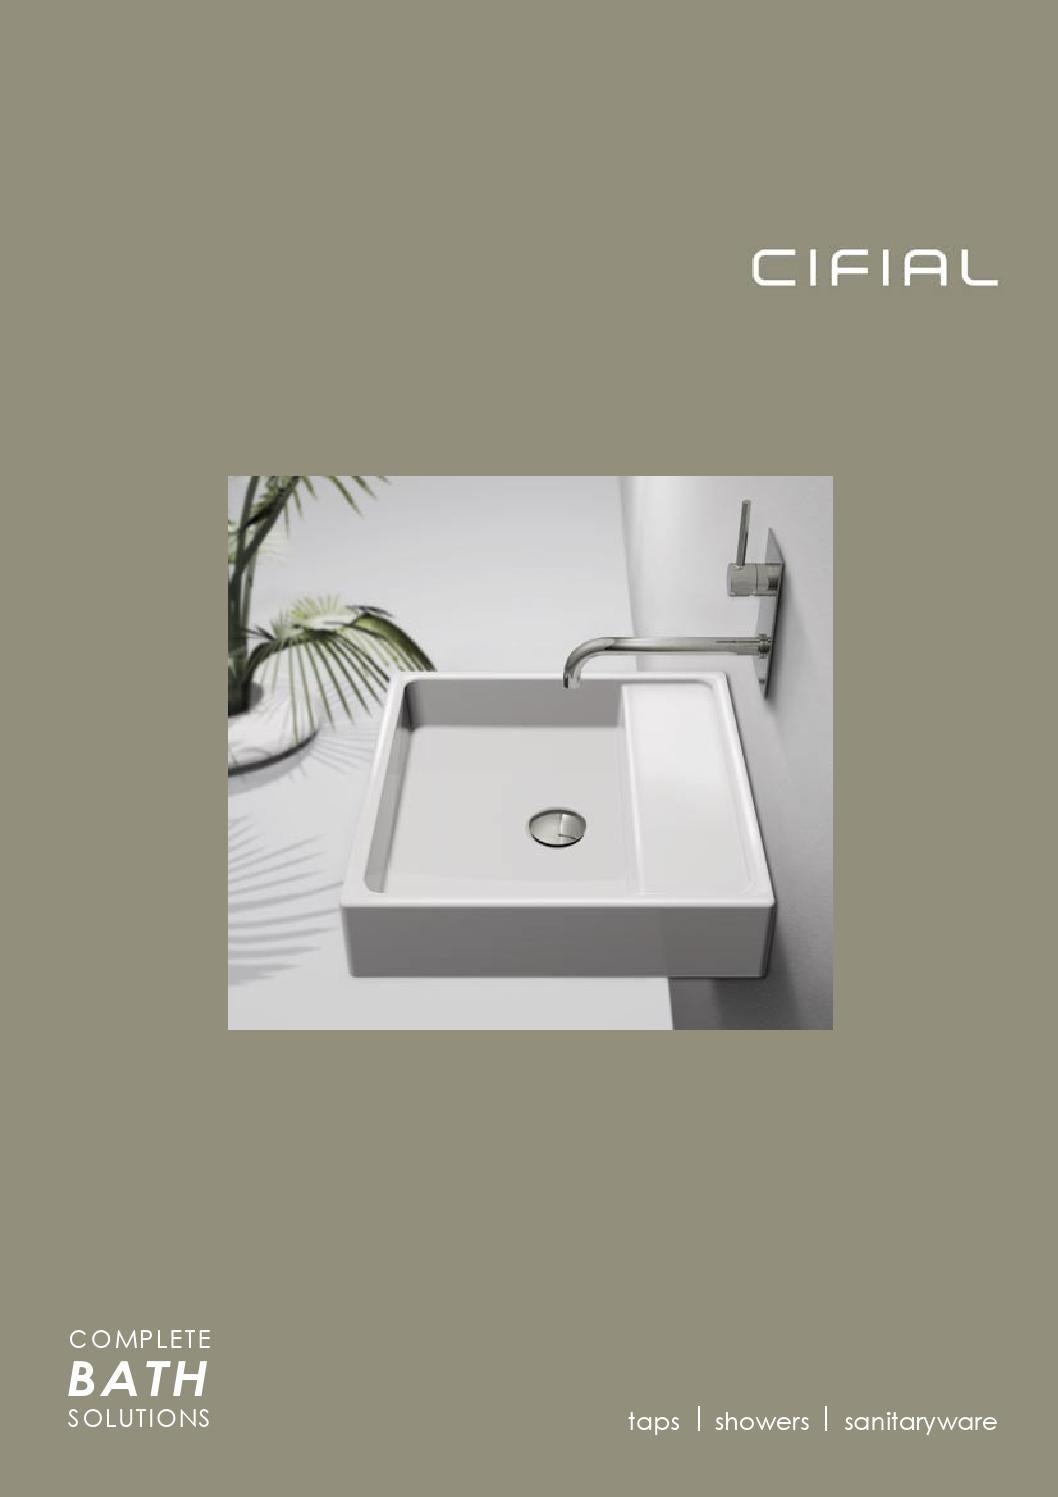 Cifial Uk 2014 Brochure By Cifial Uk Ltd Issuu